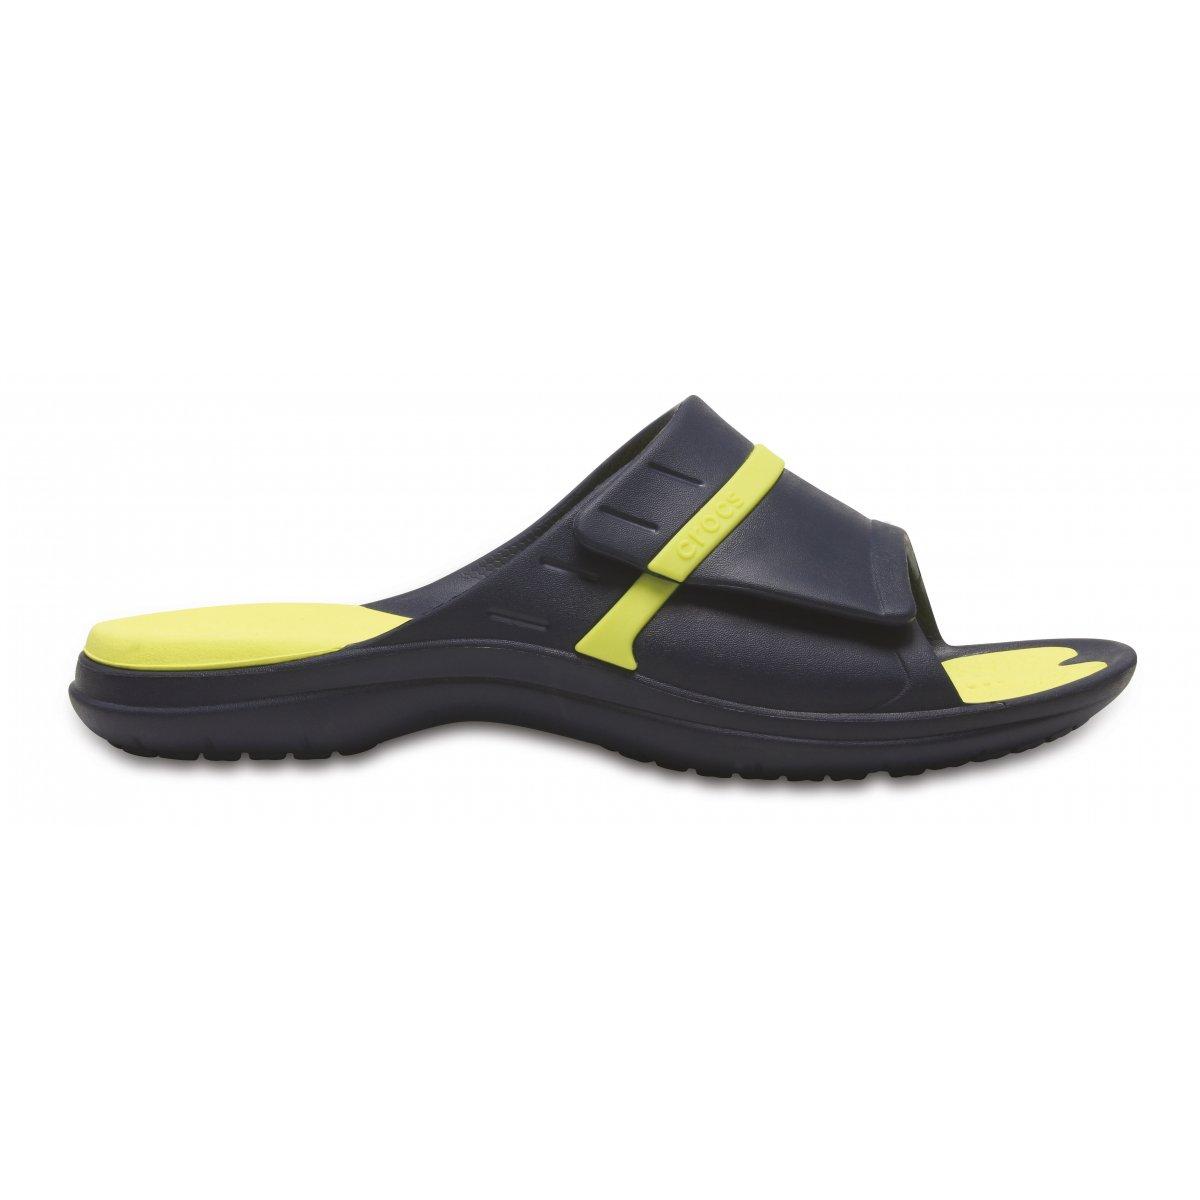 Crocs sandalo uomo modalit Sport Slide 204144